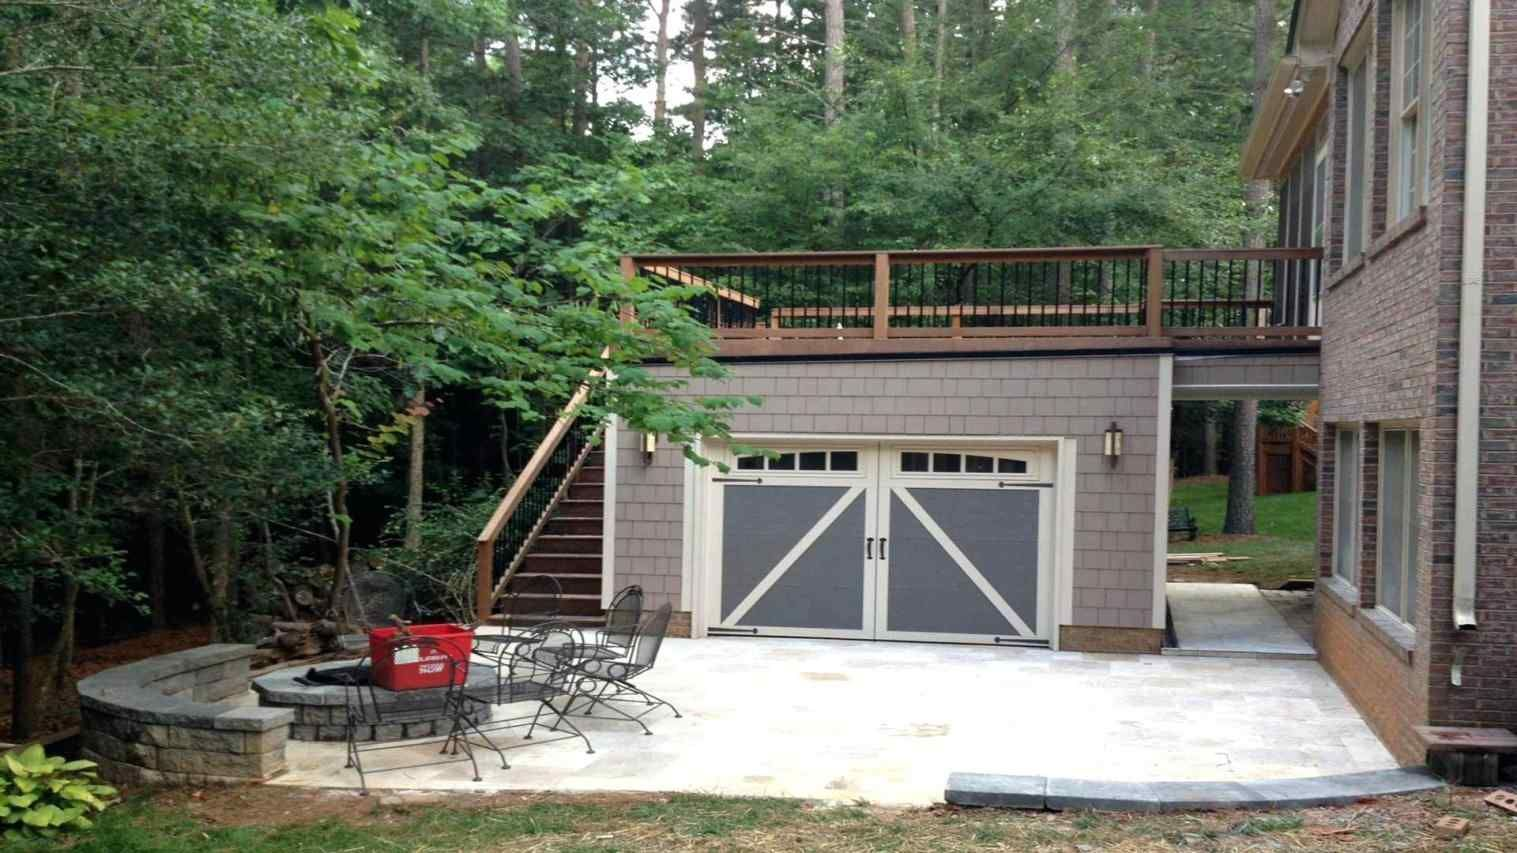 Garage Roof Deck Plans Backyard Deck Designs Inspiring Home Interior Decor Ideas Garage Design Ideas Garageroofd Deck Designs Backyard Patio Rooftop Patio